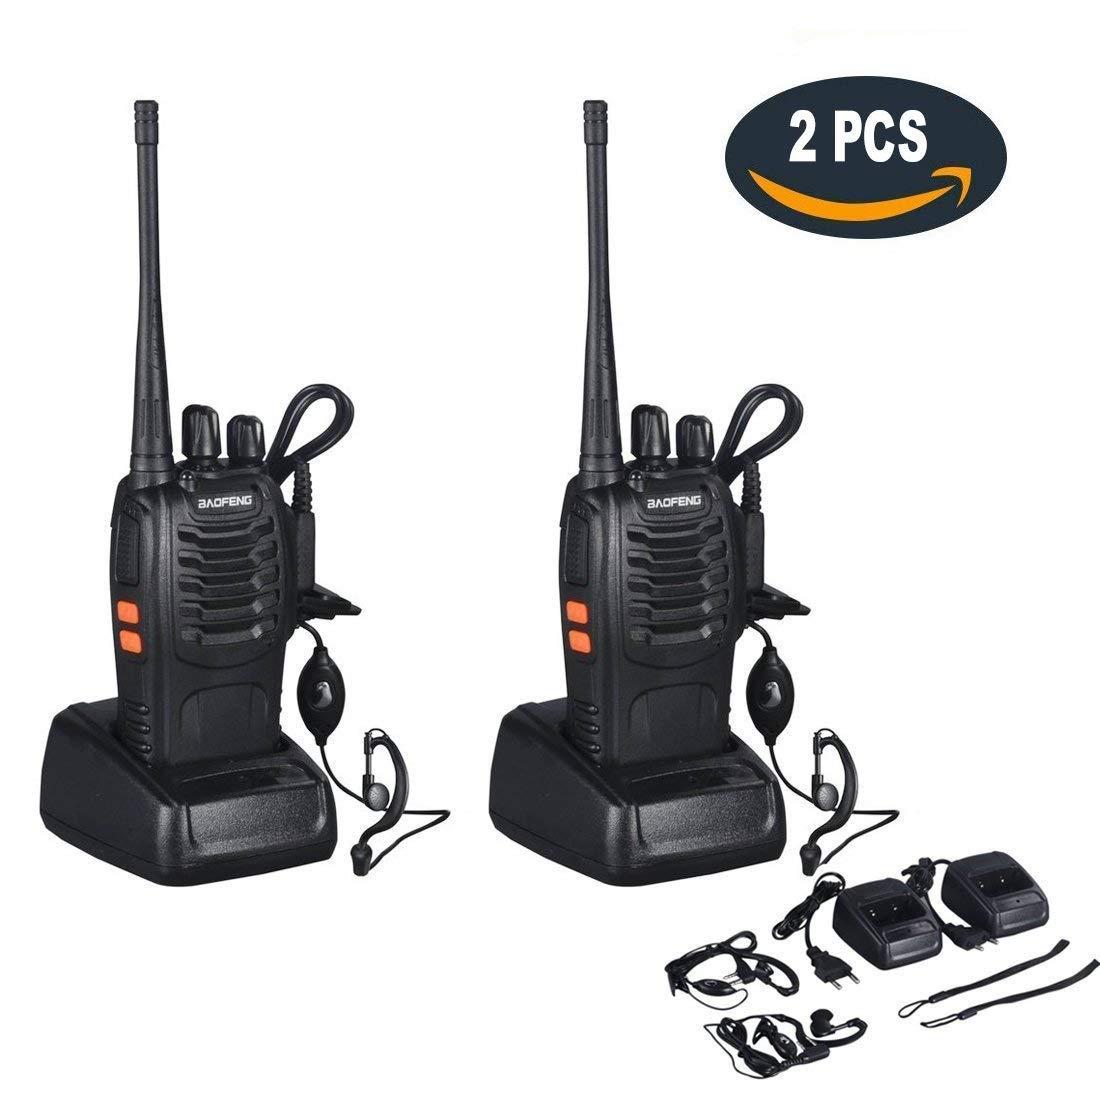 Dpower BF-888S Walkie Talkie 16 Canales UHF 400-470MHz 105 CDCSS Recargable Alcance de hasta 3 Km con Auriculares (Un par)